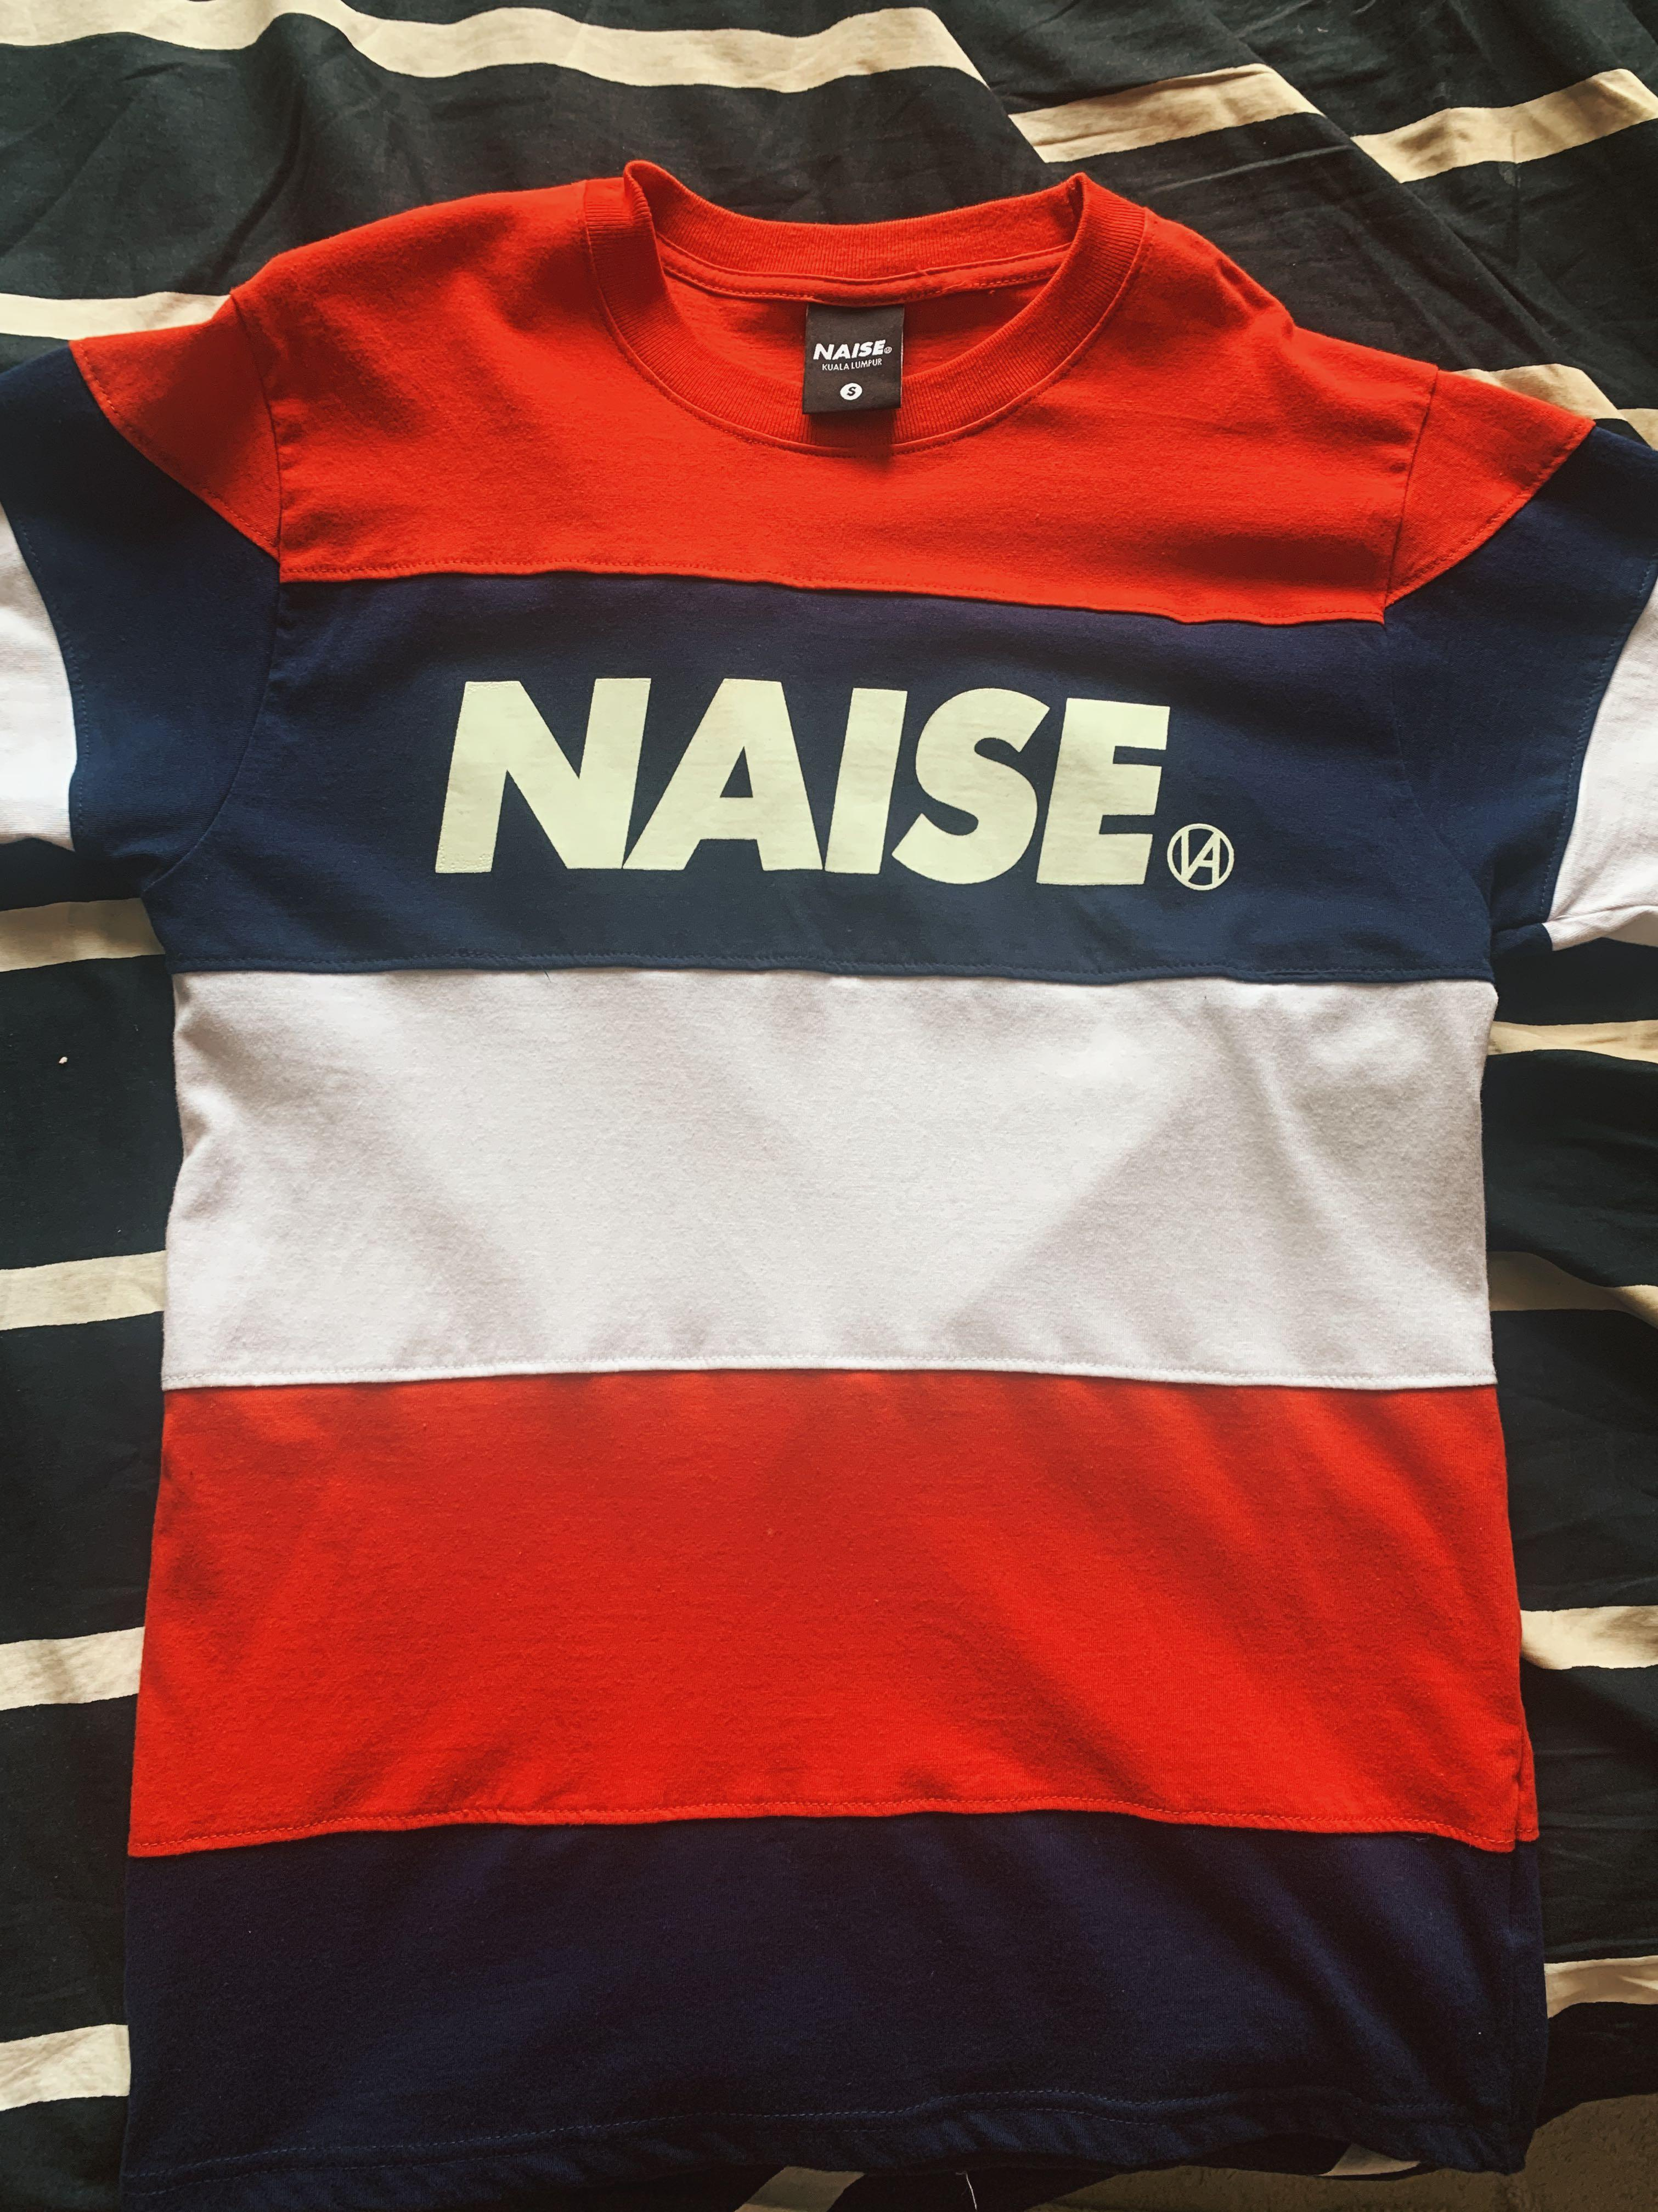 NAISE TEE